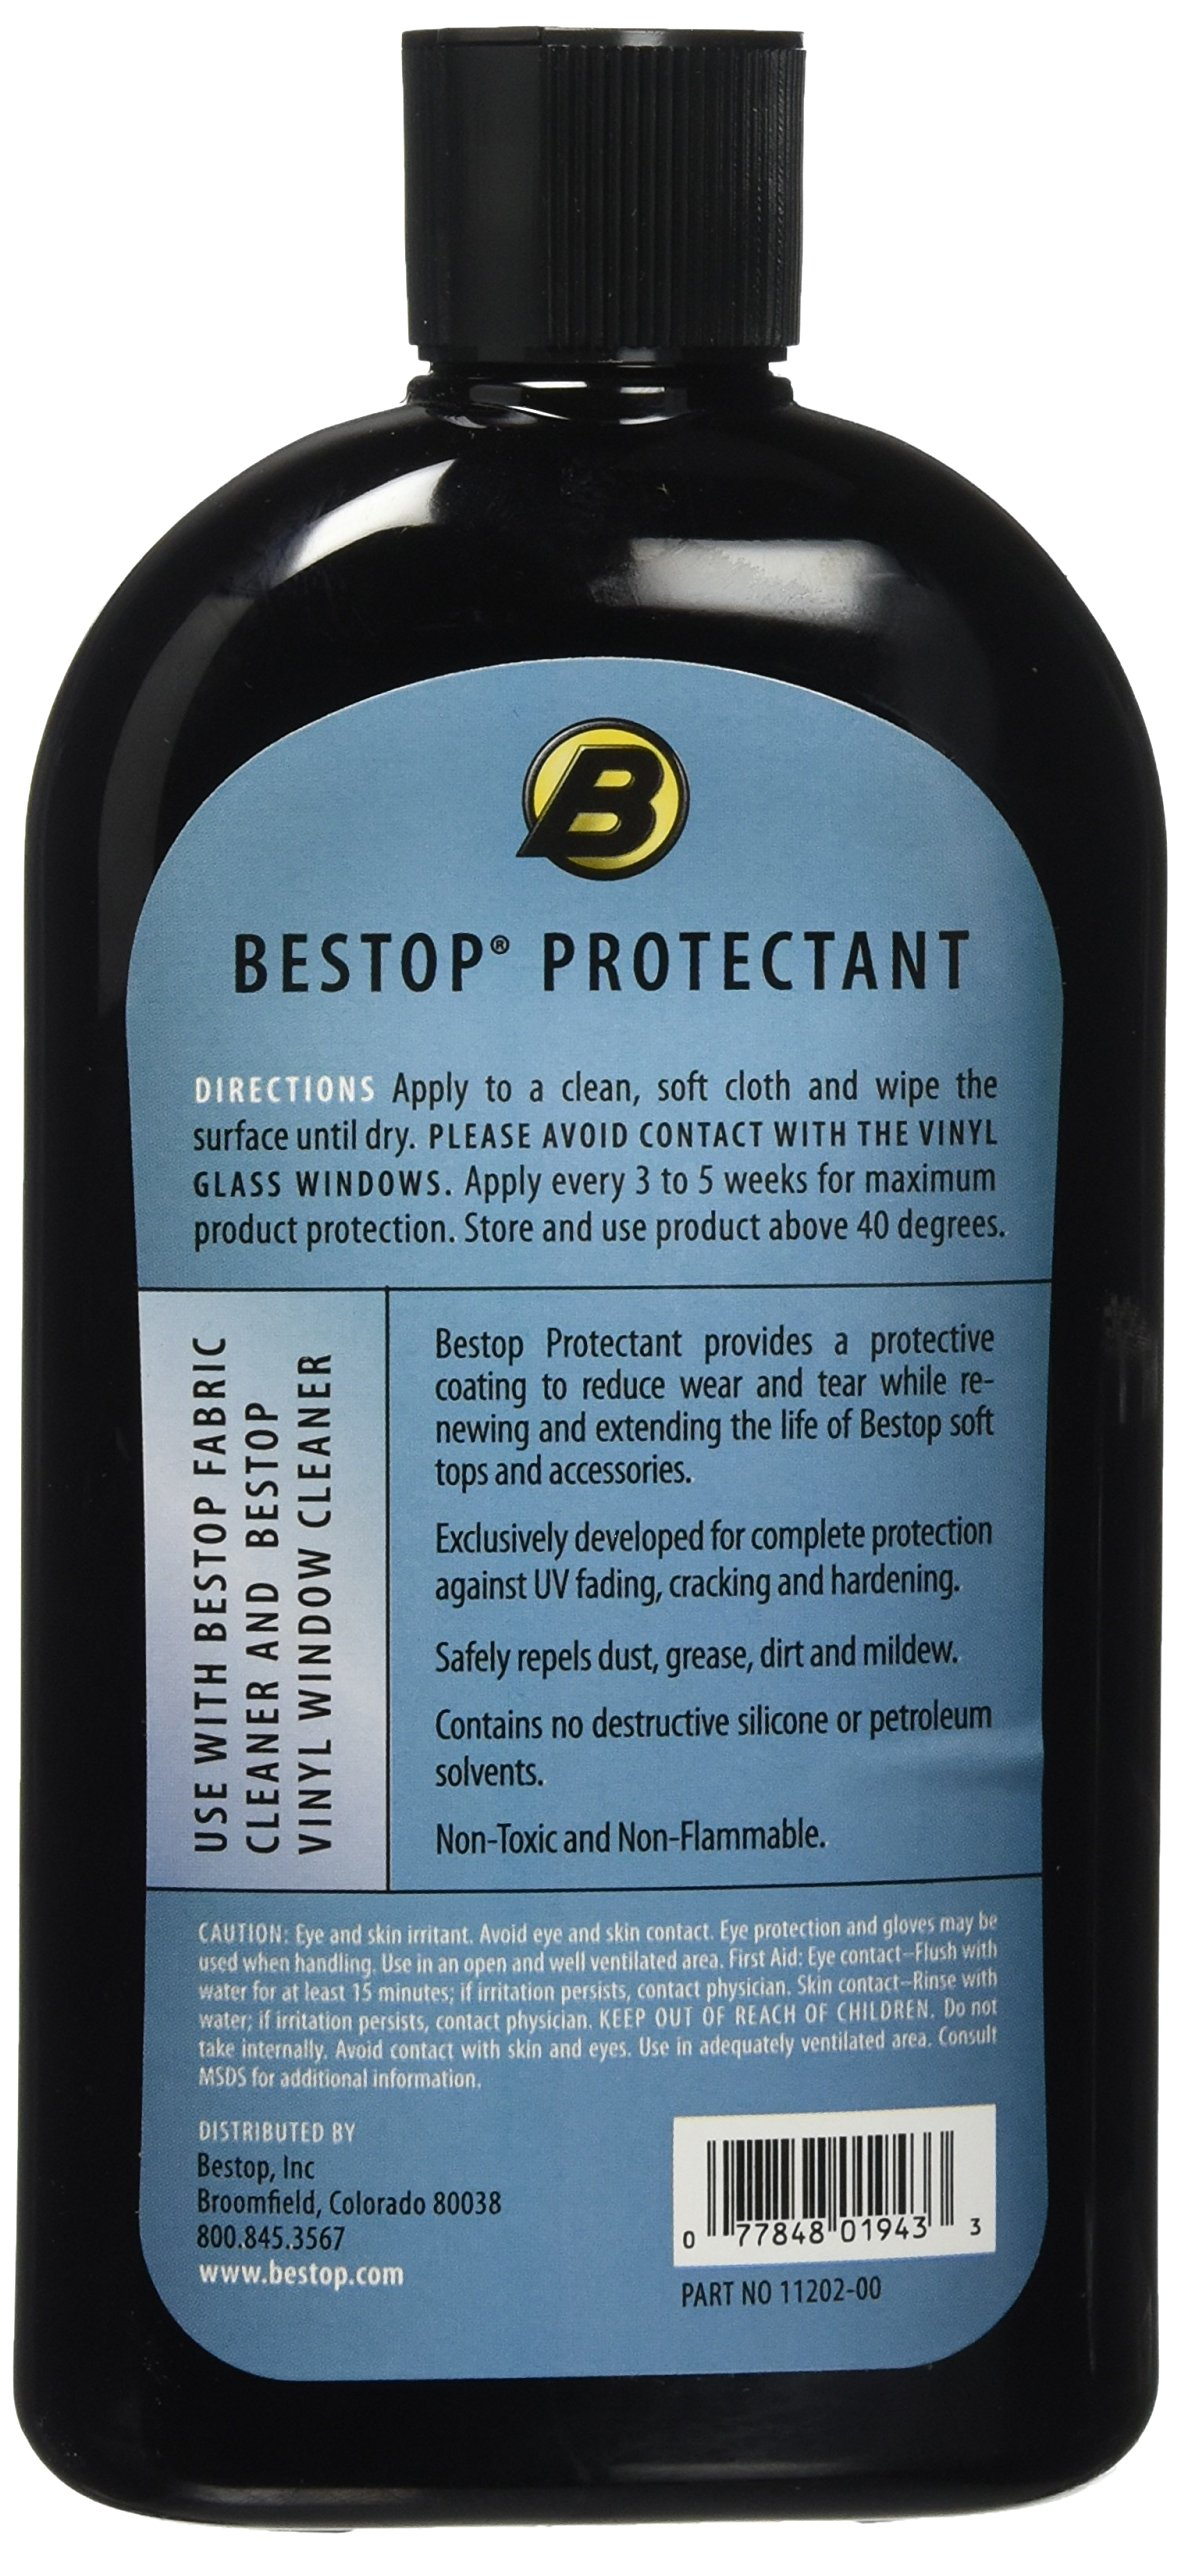 Bestop 11212-00 Vinyl Fabric Protectant, 16 oz single bottle - boxed by Bestop (Image #2)